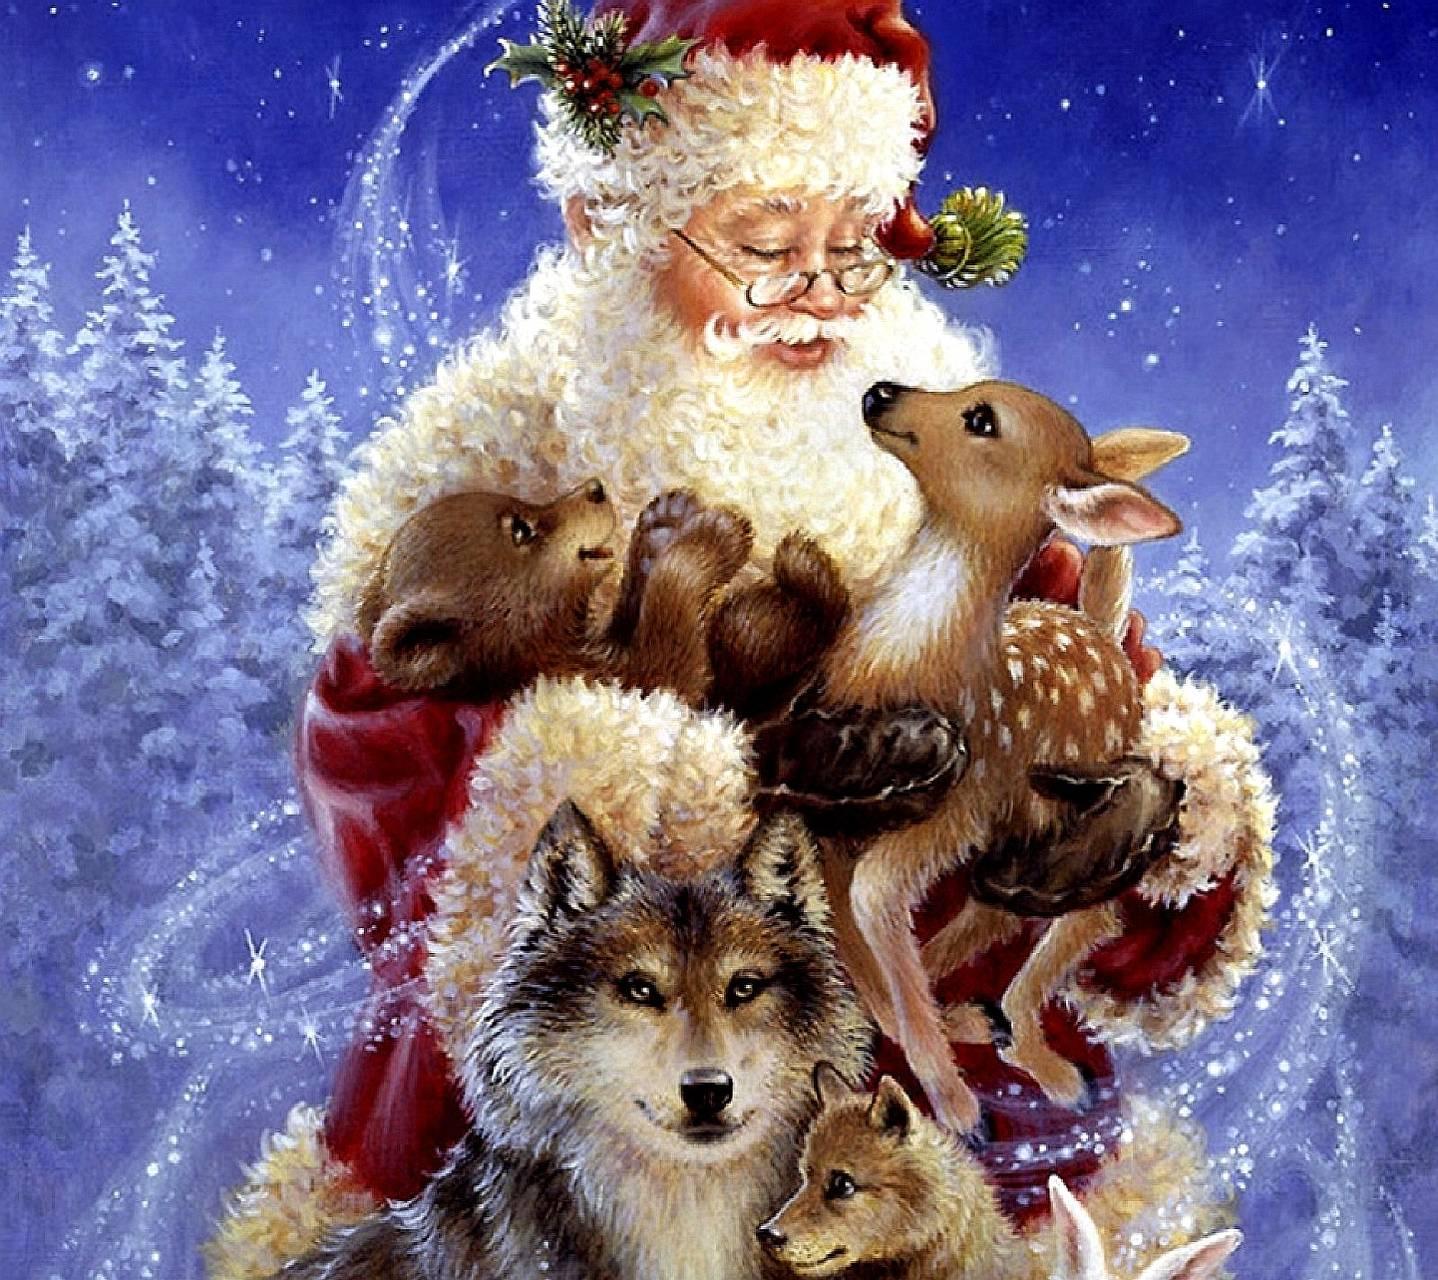 Santa Clause-------